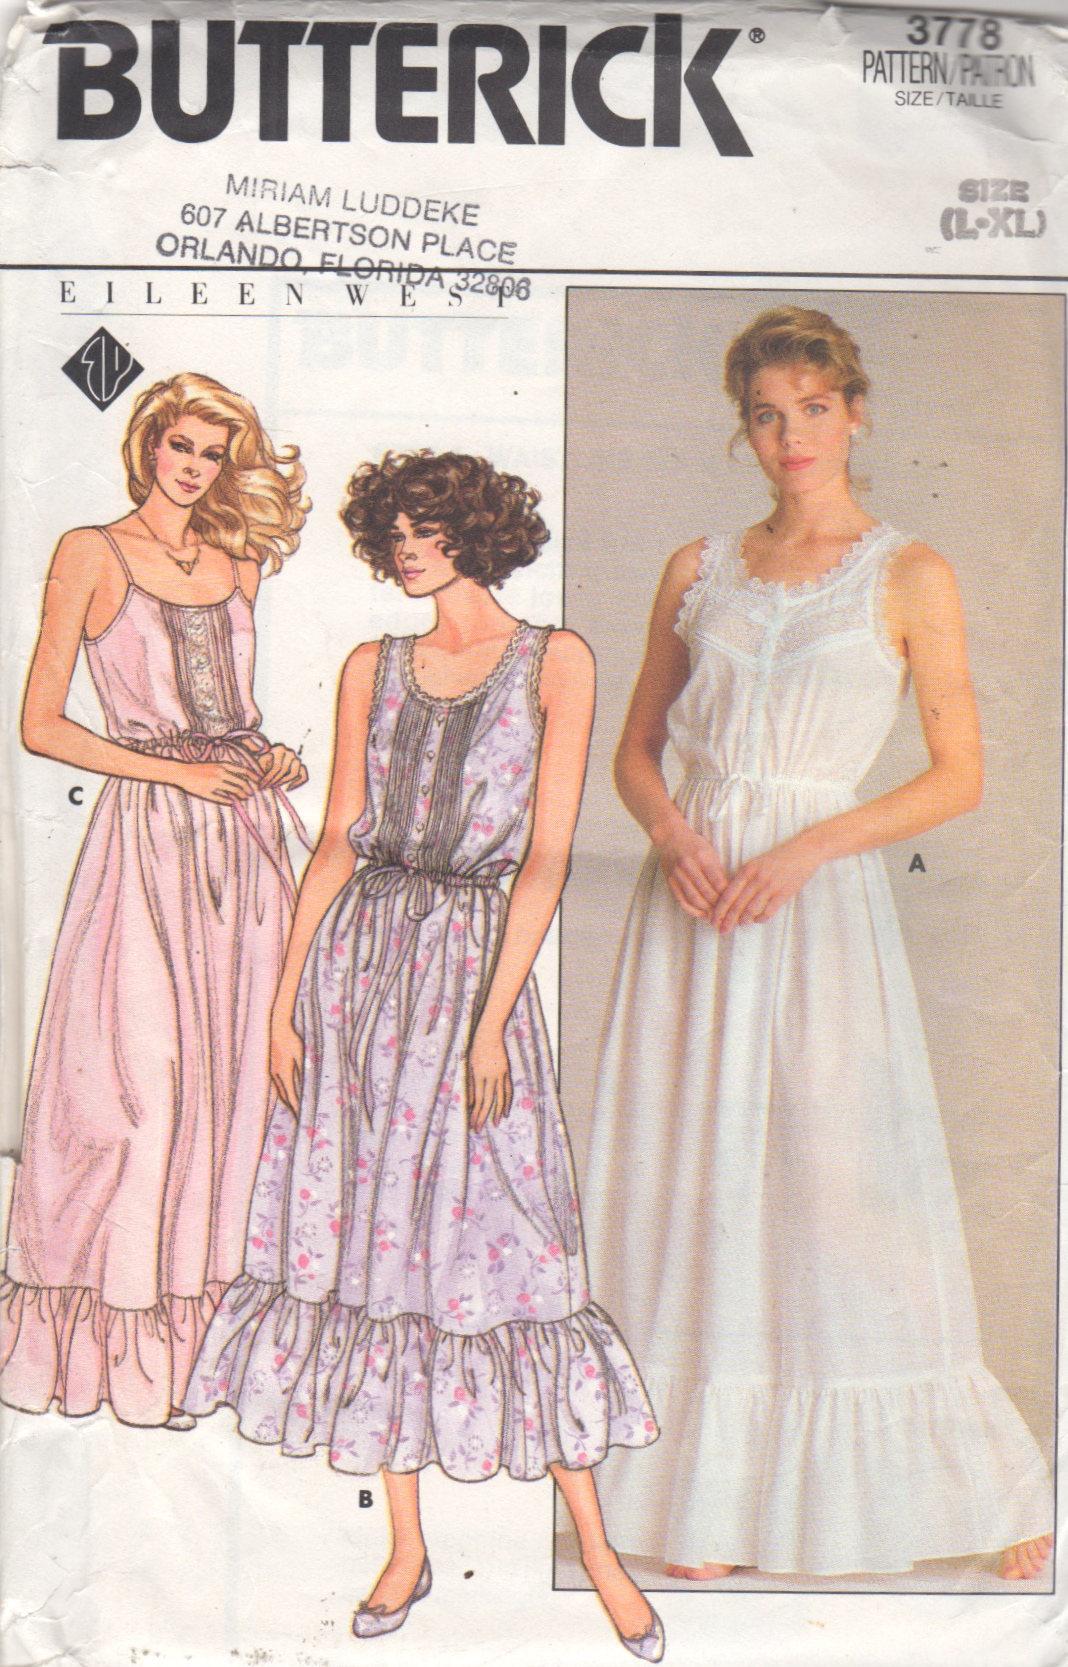 Butterick 3778 1980s EILEEN WEST Misses Romantic Nightgown Pattern ...